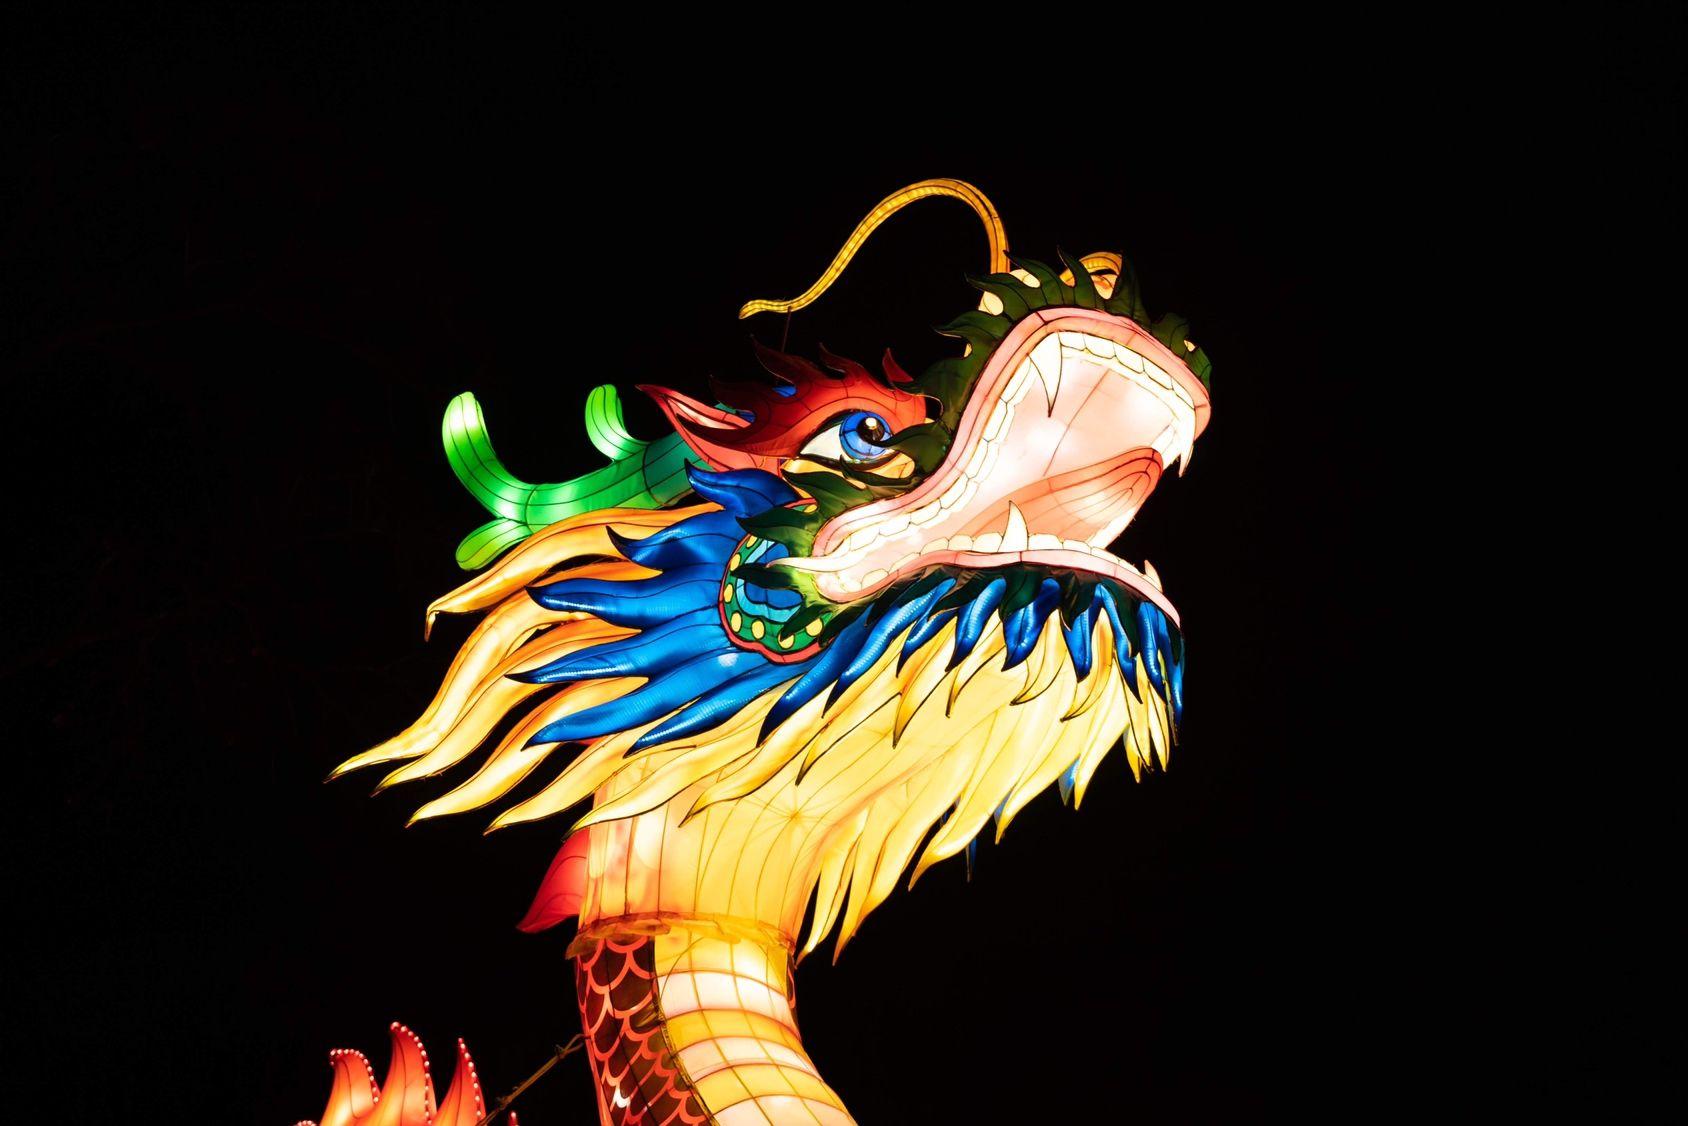 Nyc Winter Lantern Festival Snug Harbor Cultural